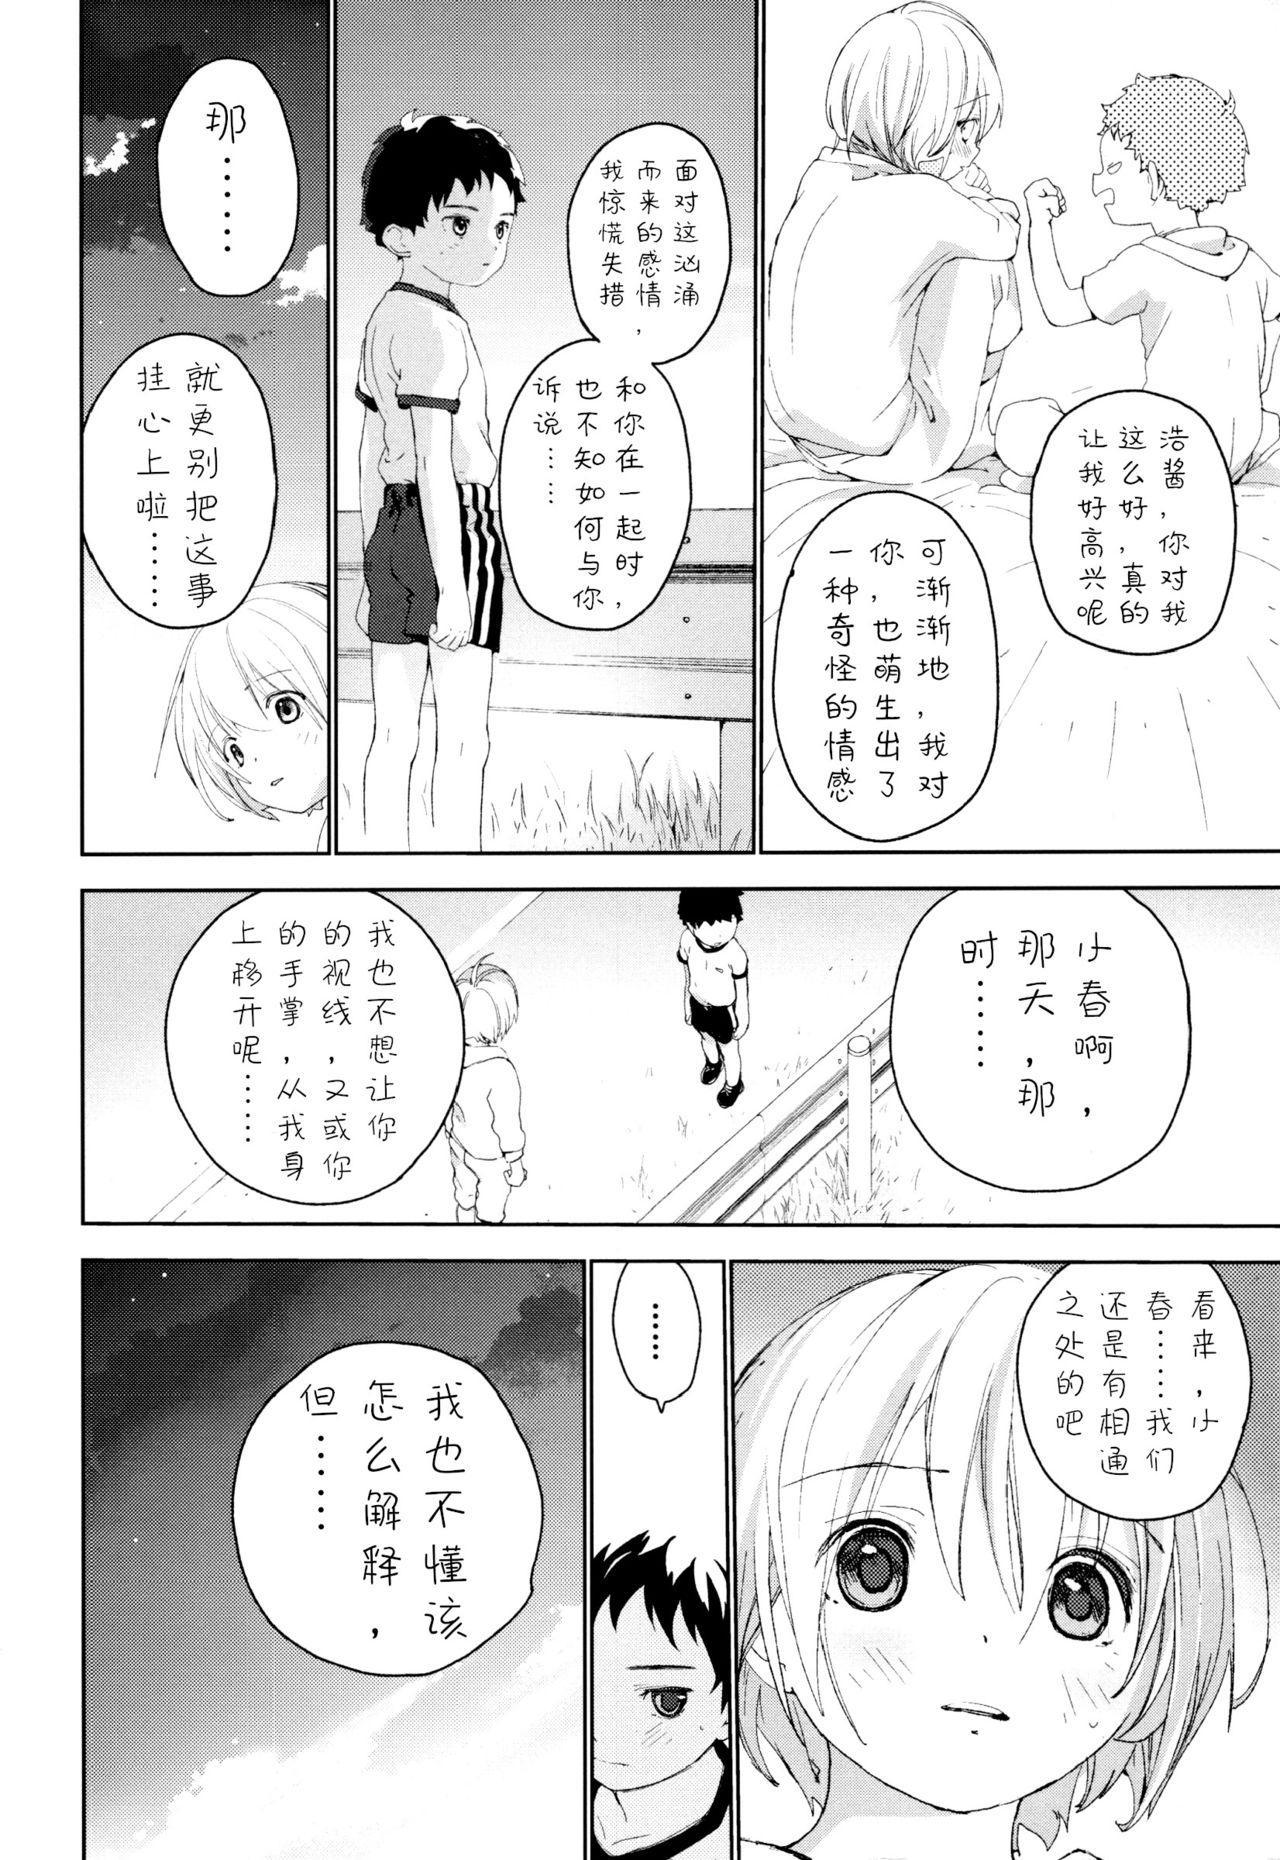 Osananajimi | 青梅竹马 52